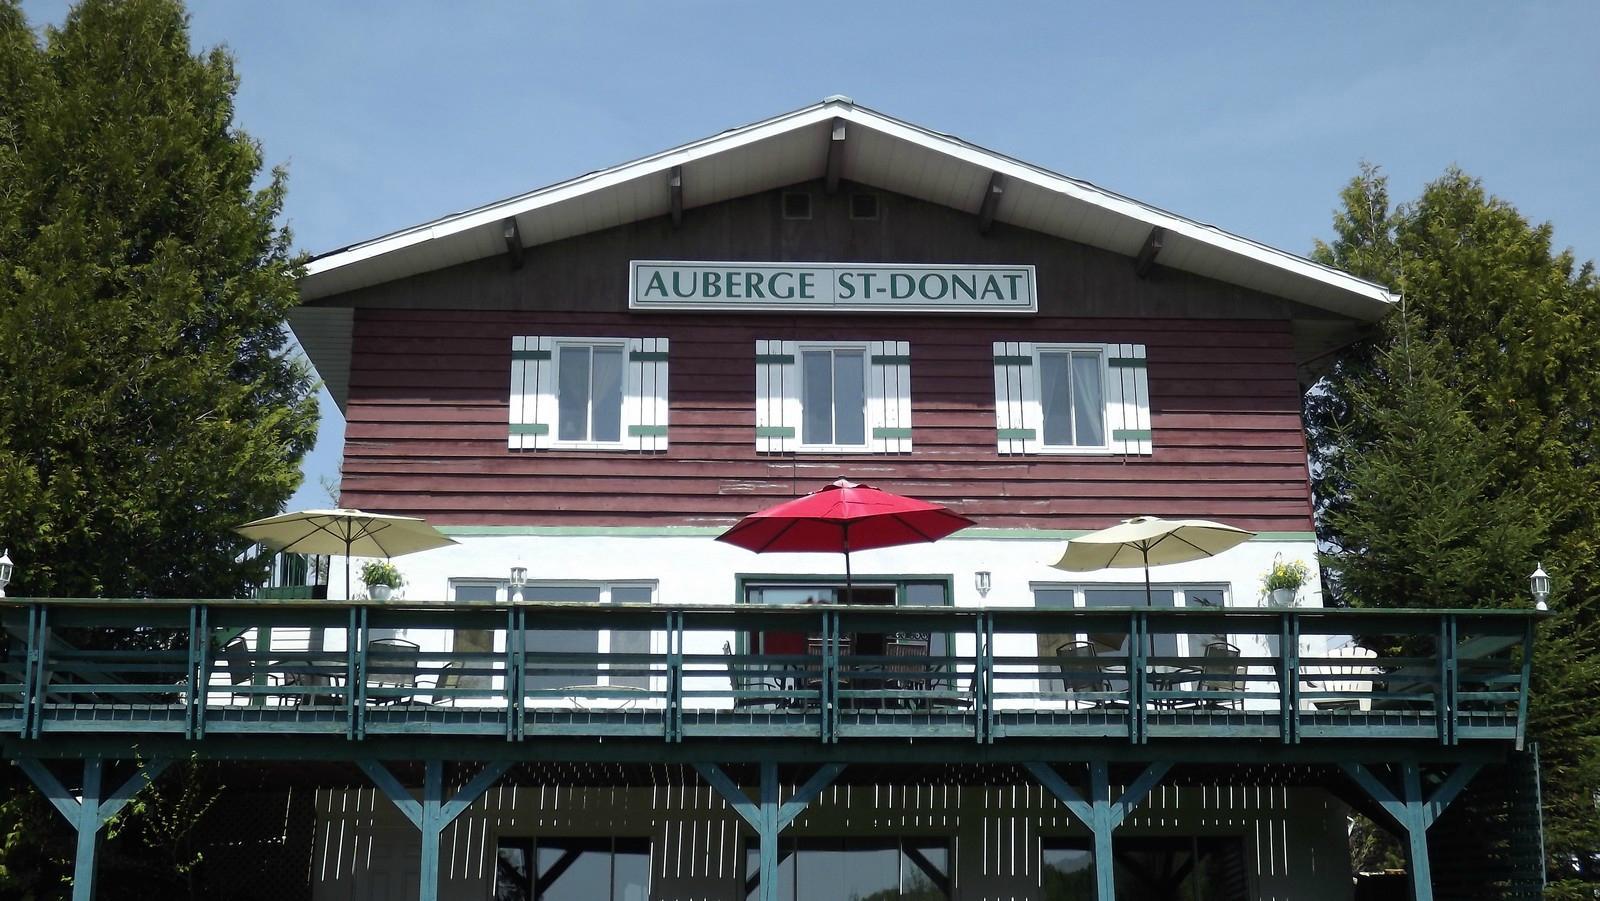 Auberge Saint-Donat